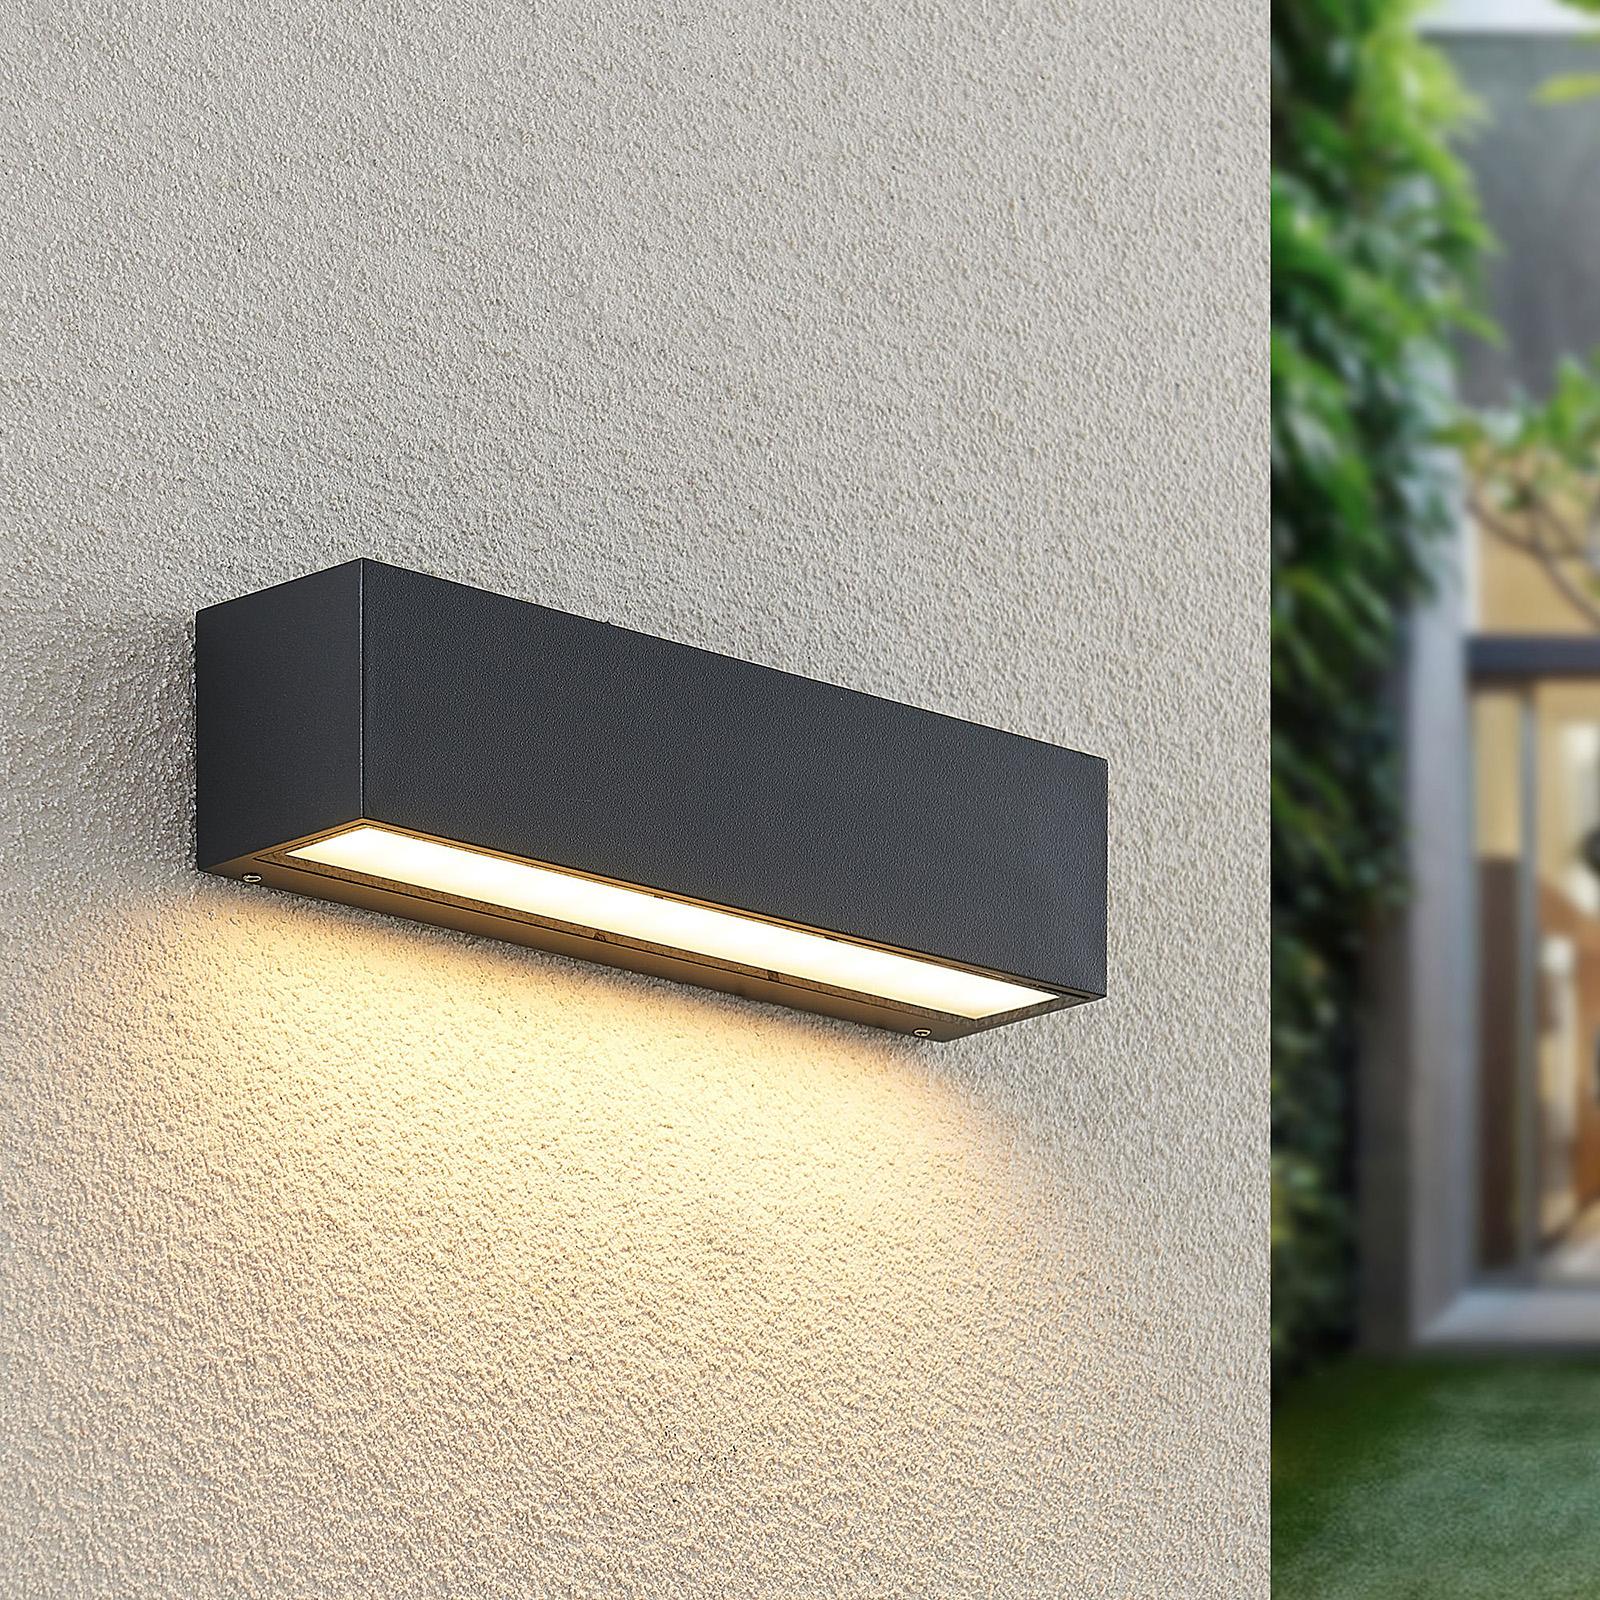 Lucande Lengo LED-Wandlampe, 25 cm, grafit, 1-fl.